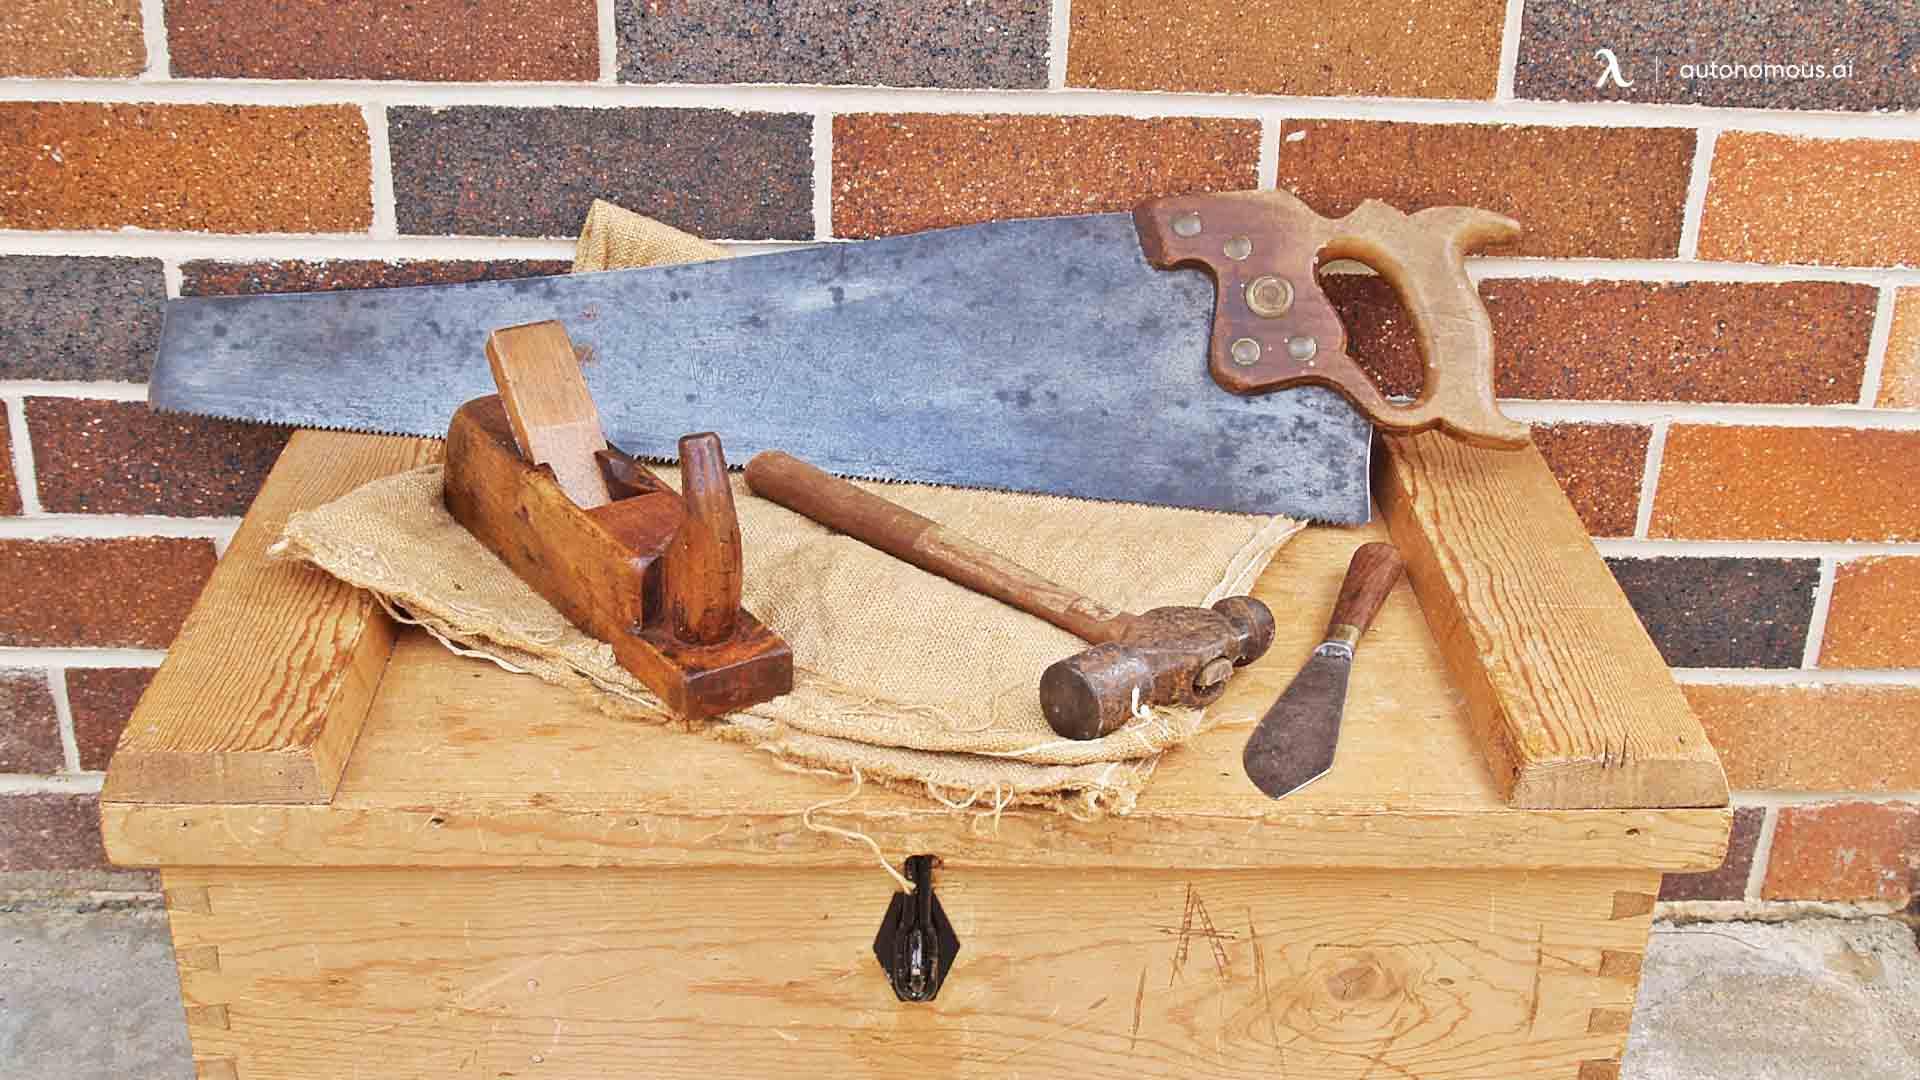 Tools Needed to Make a Wood Desktop Standing Desk